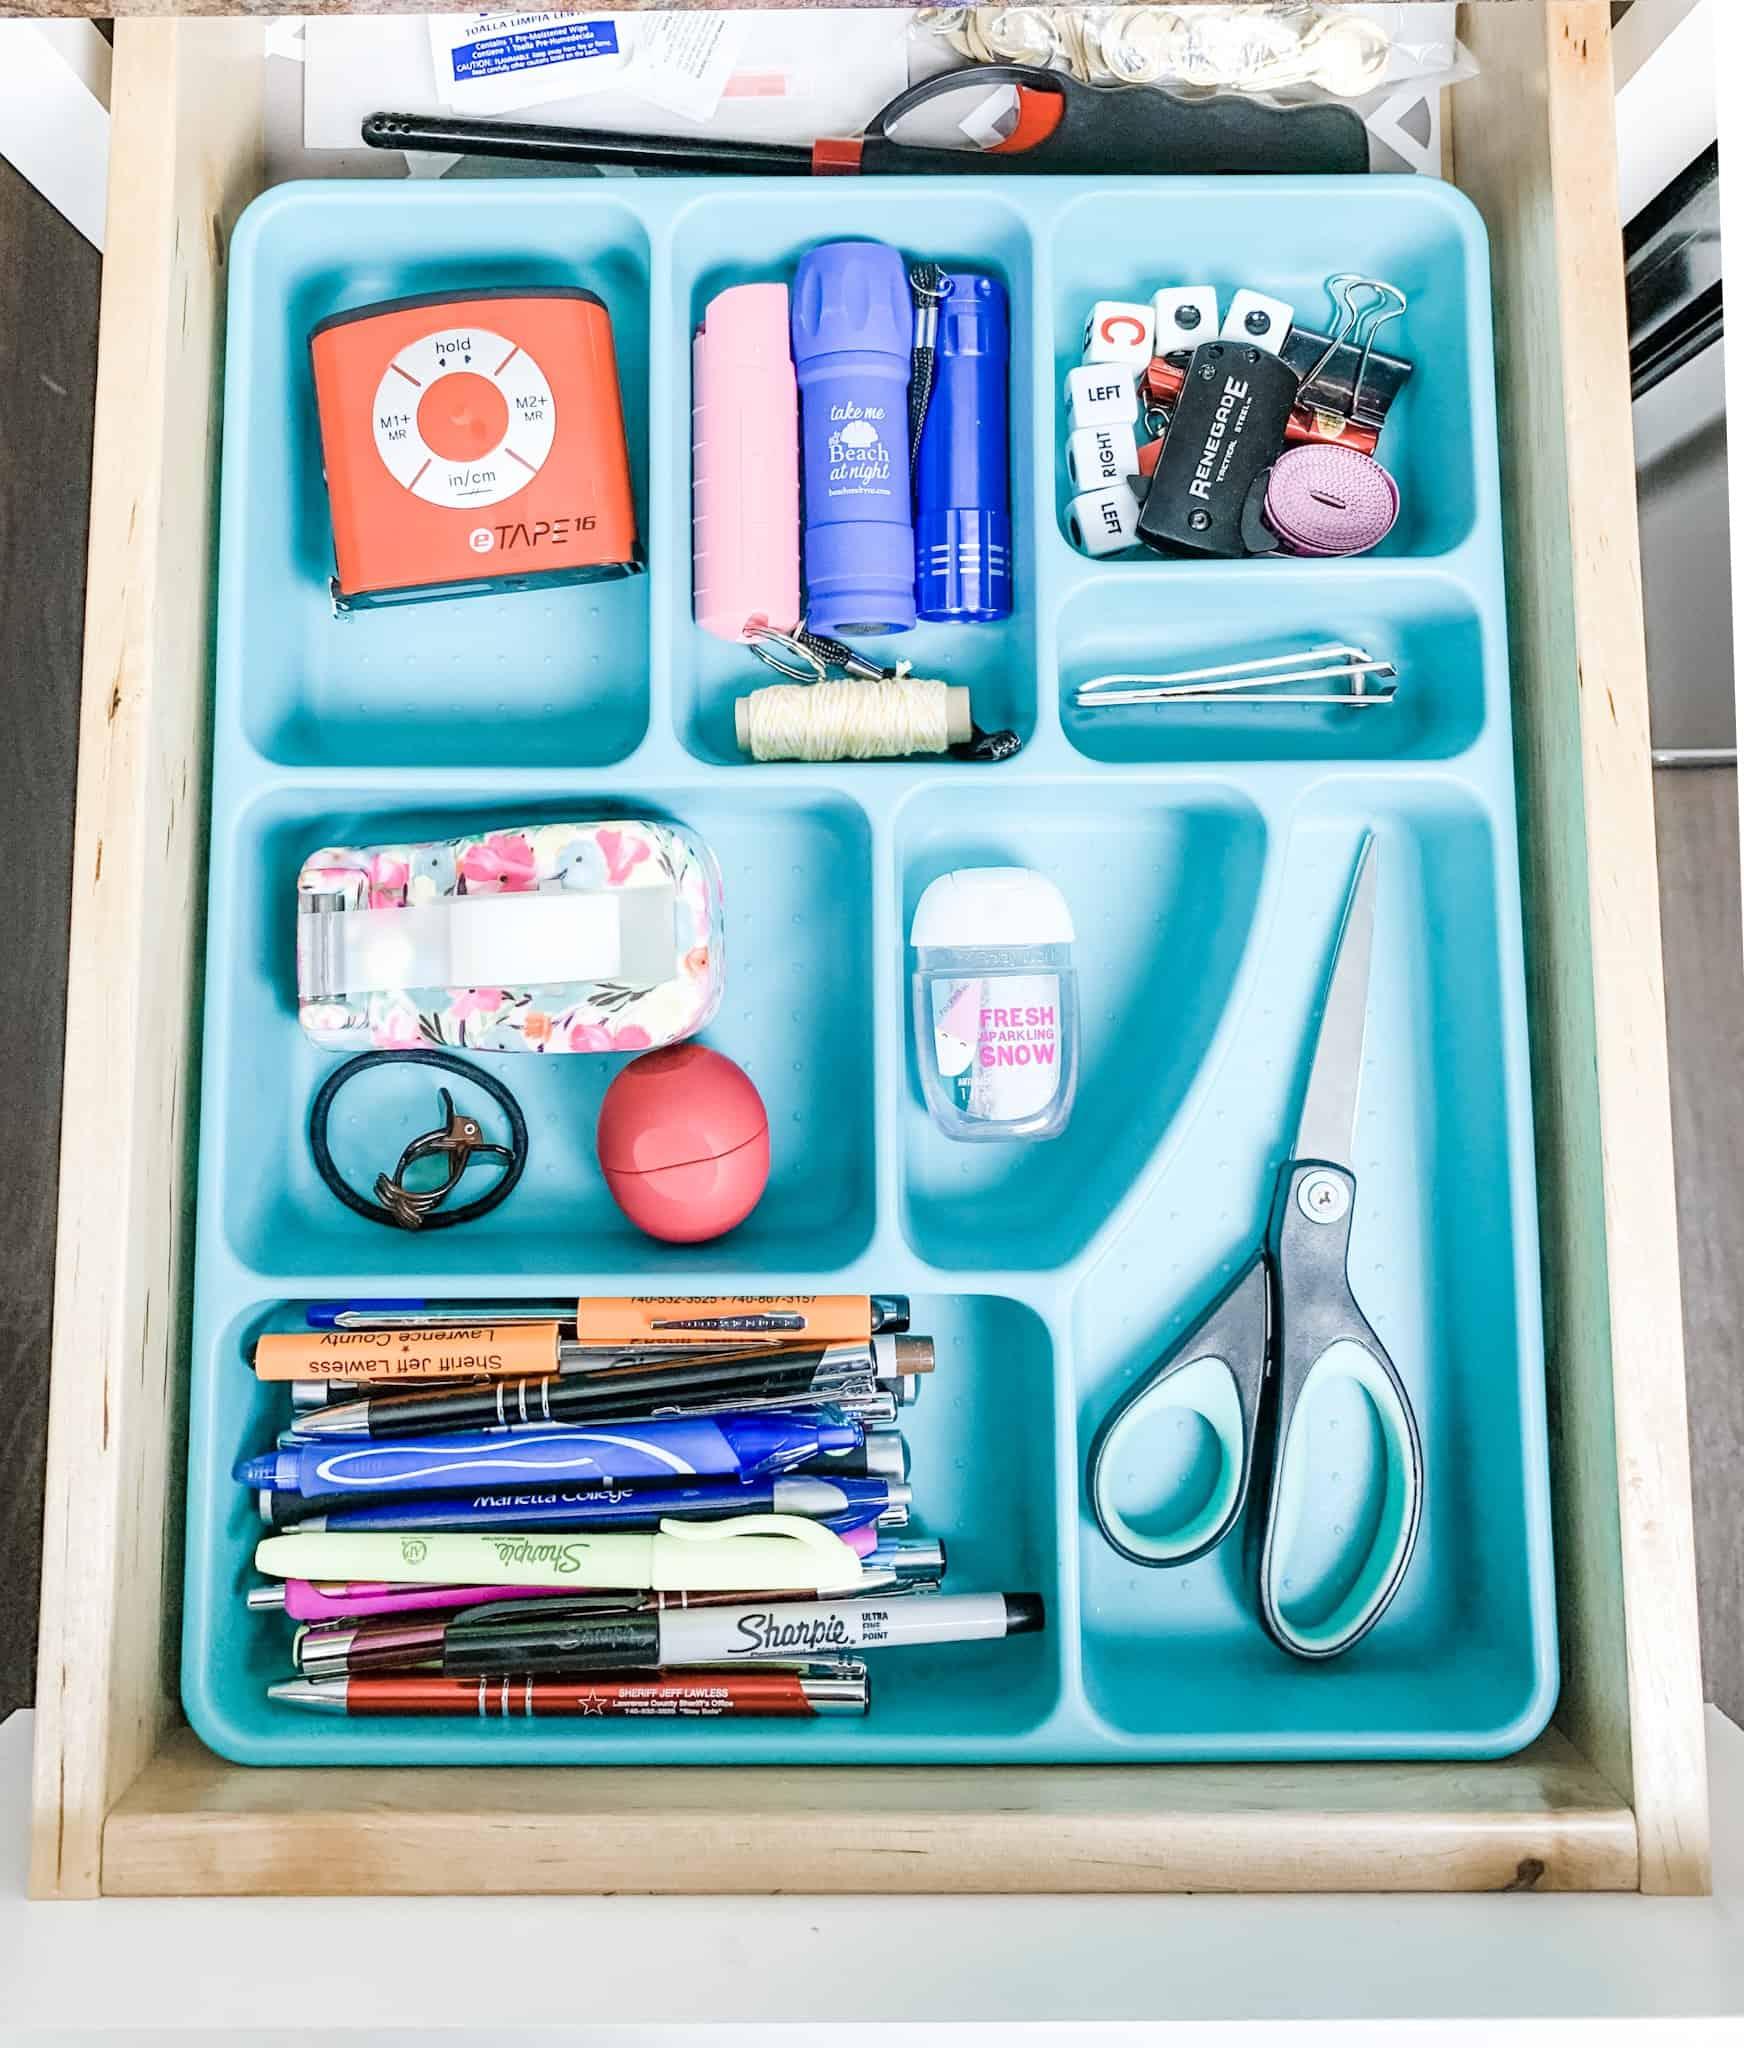 Junk drawer organizing ideas